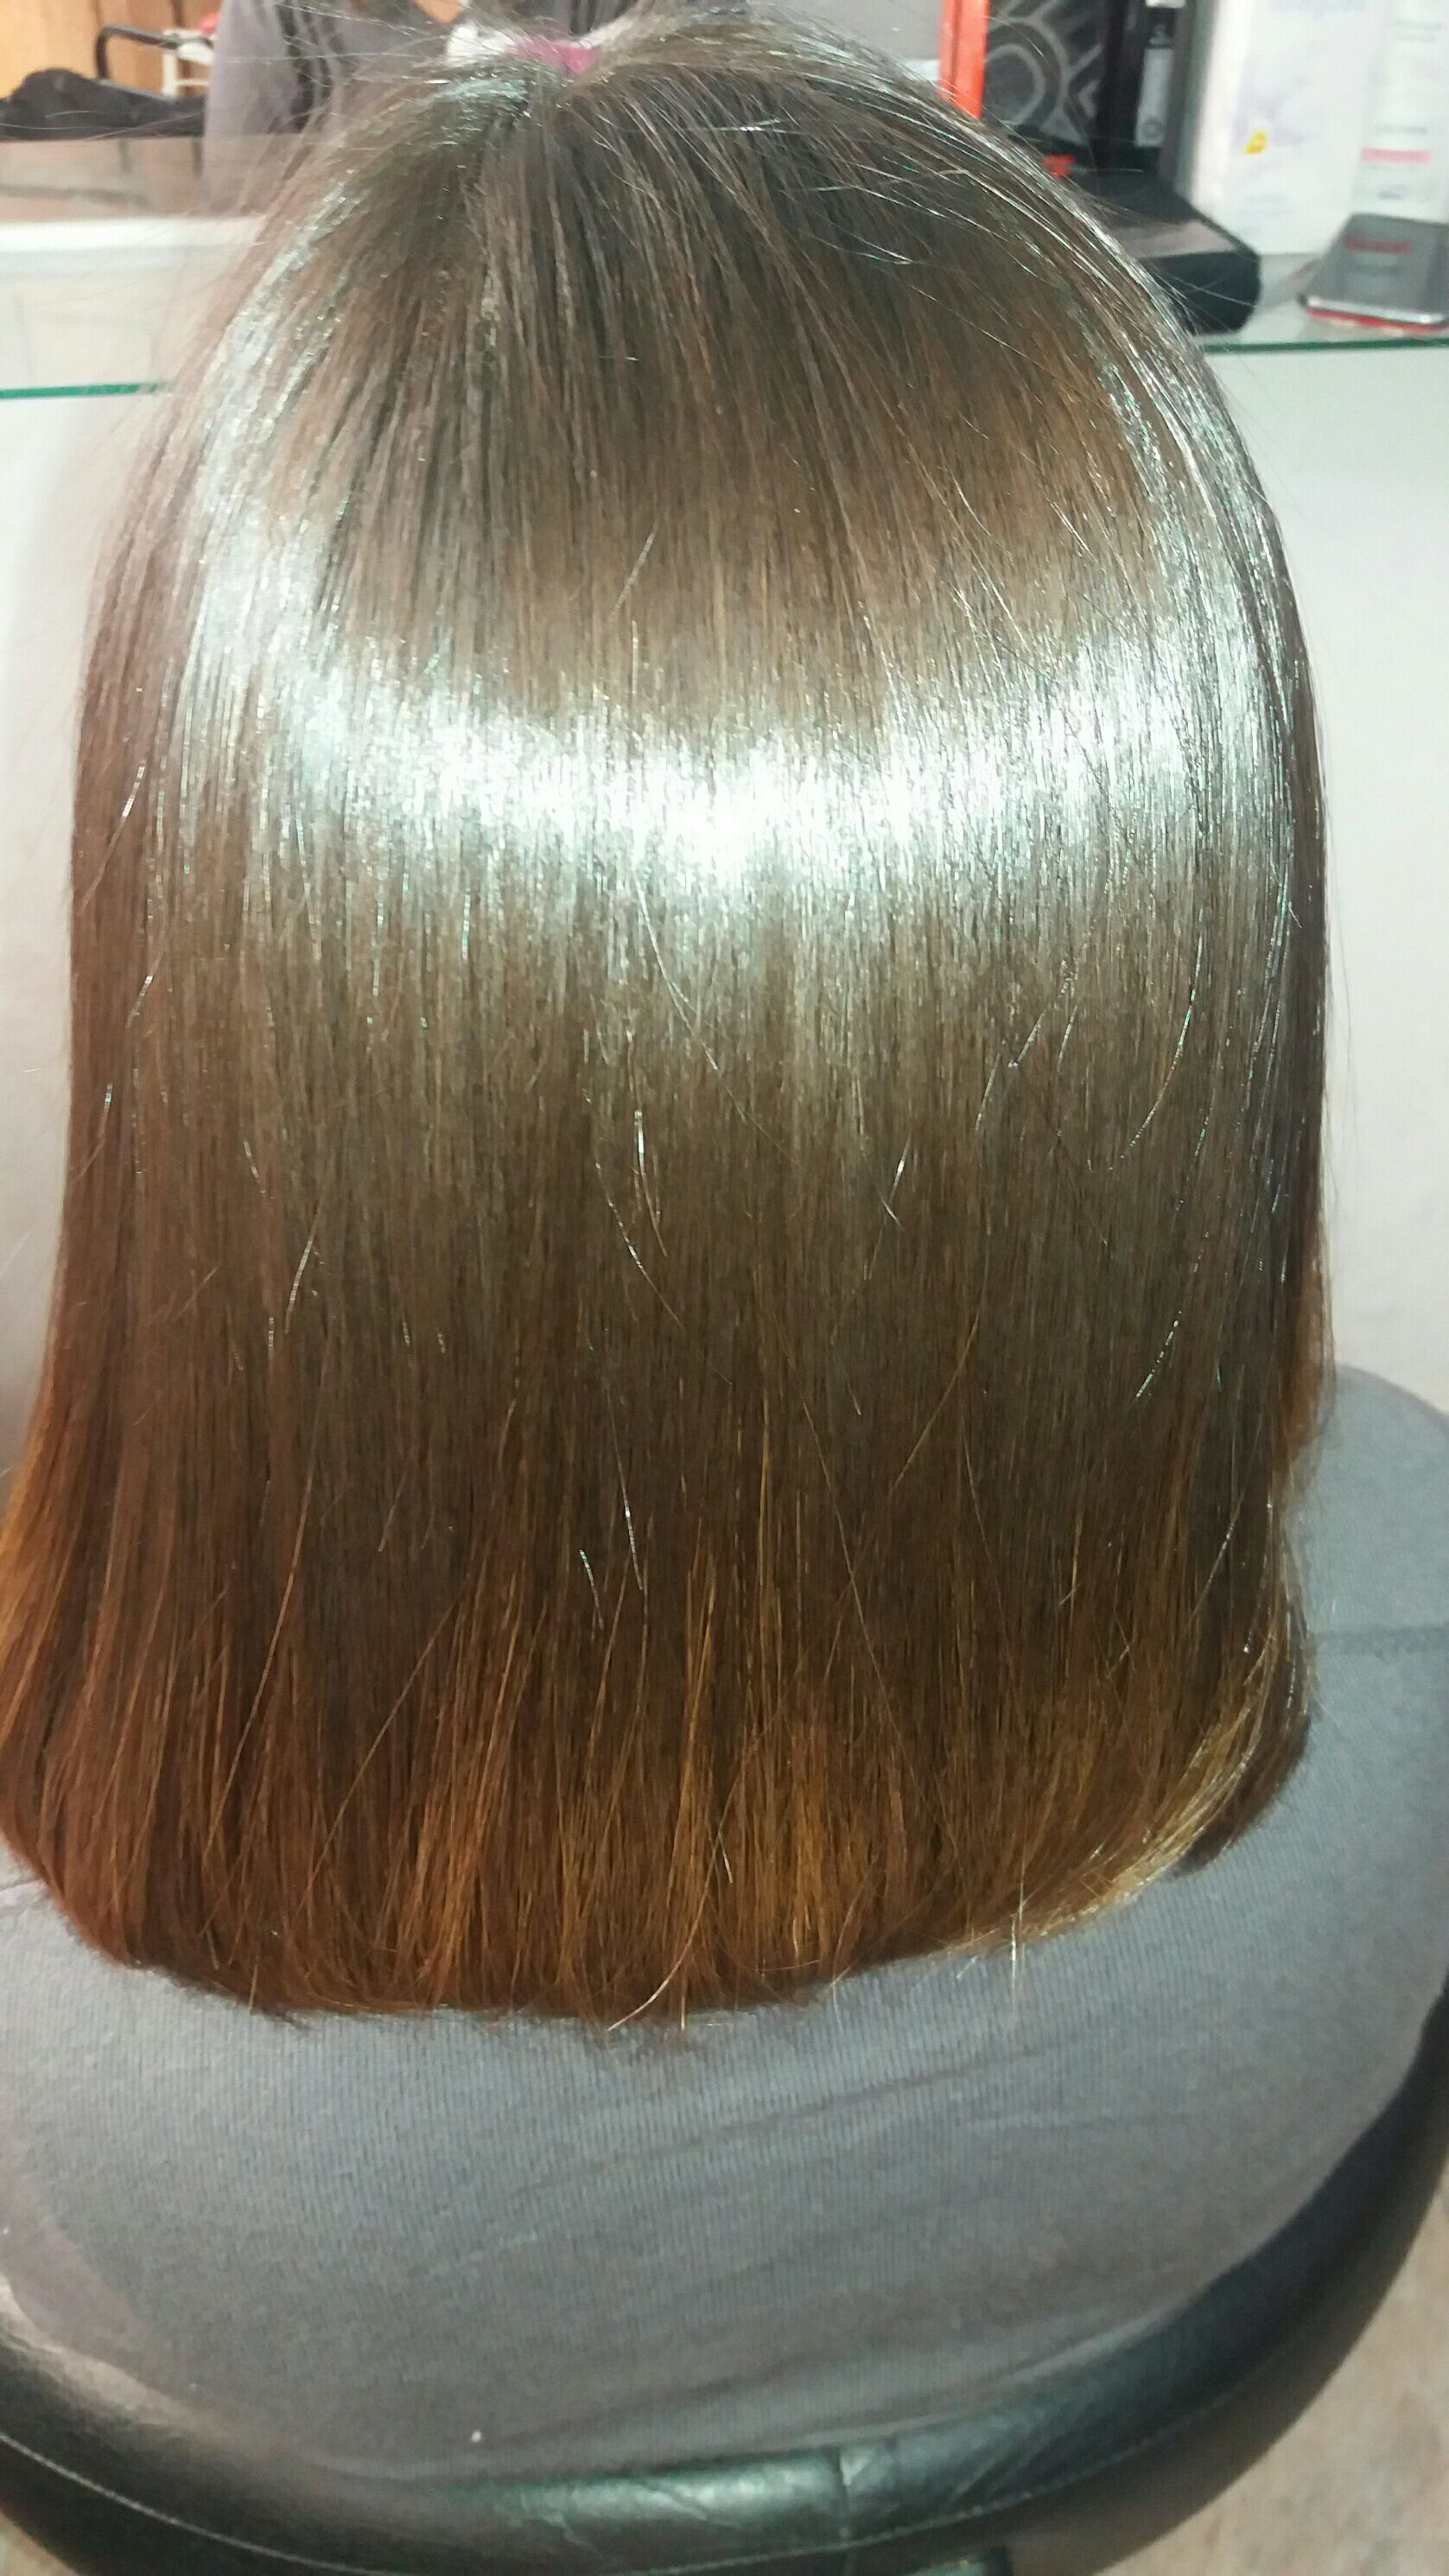 Banho de cristal cabelo esteticista cabeleireiro(a)